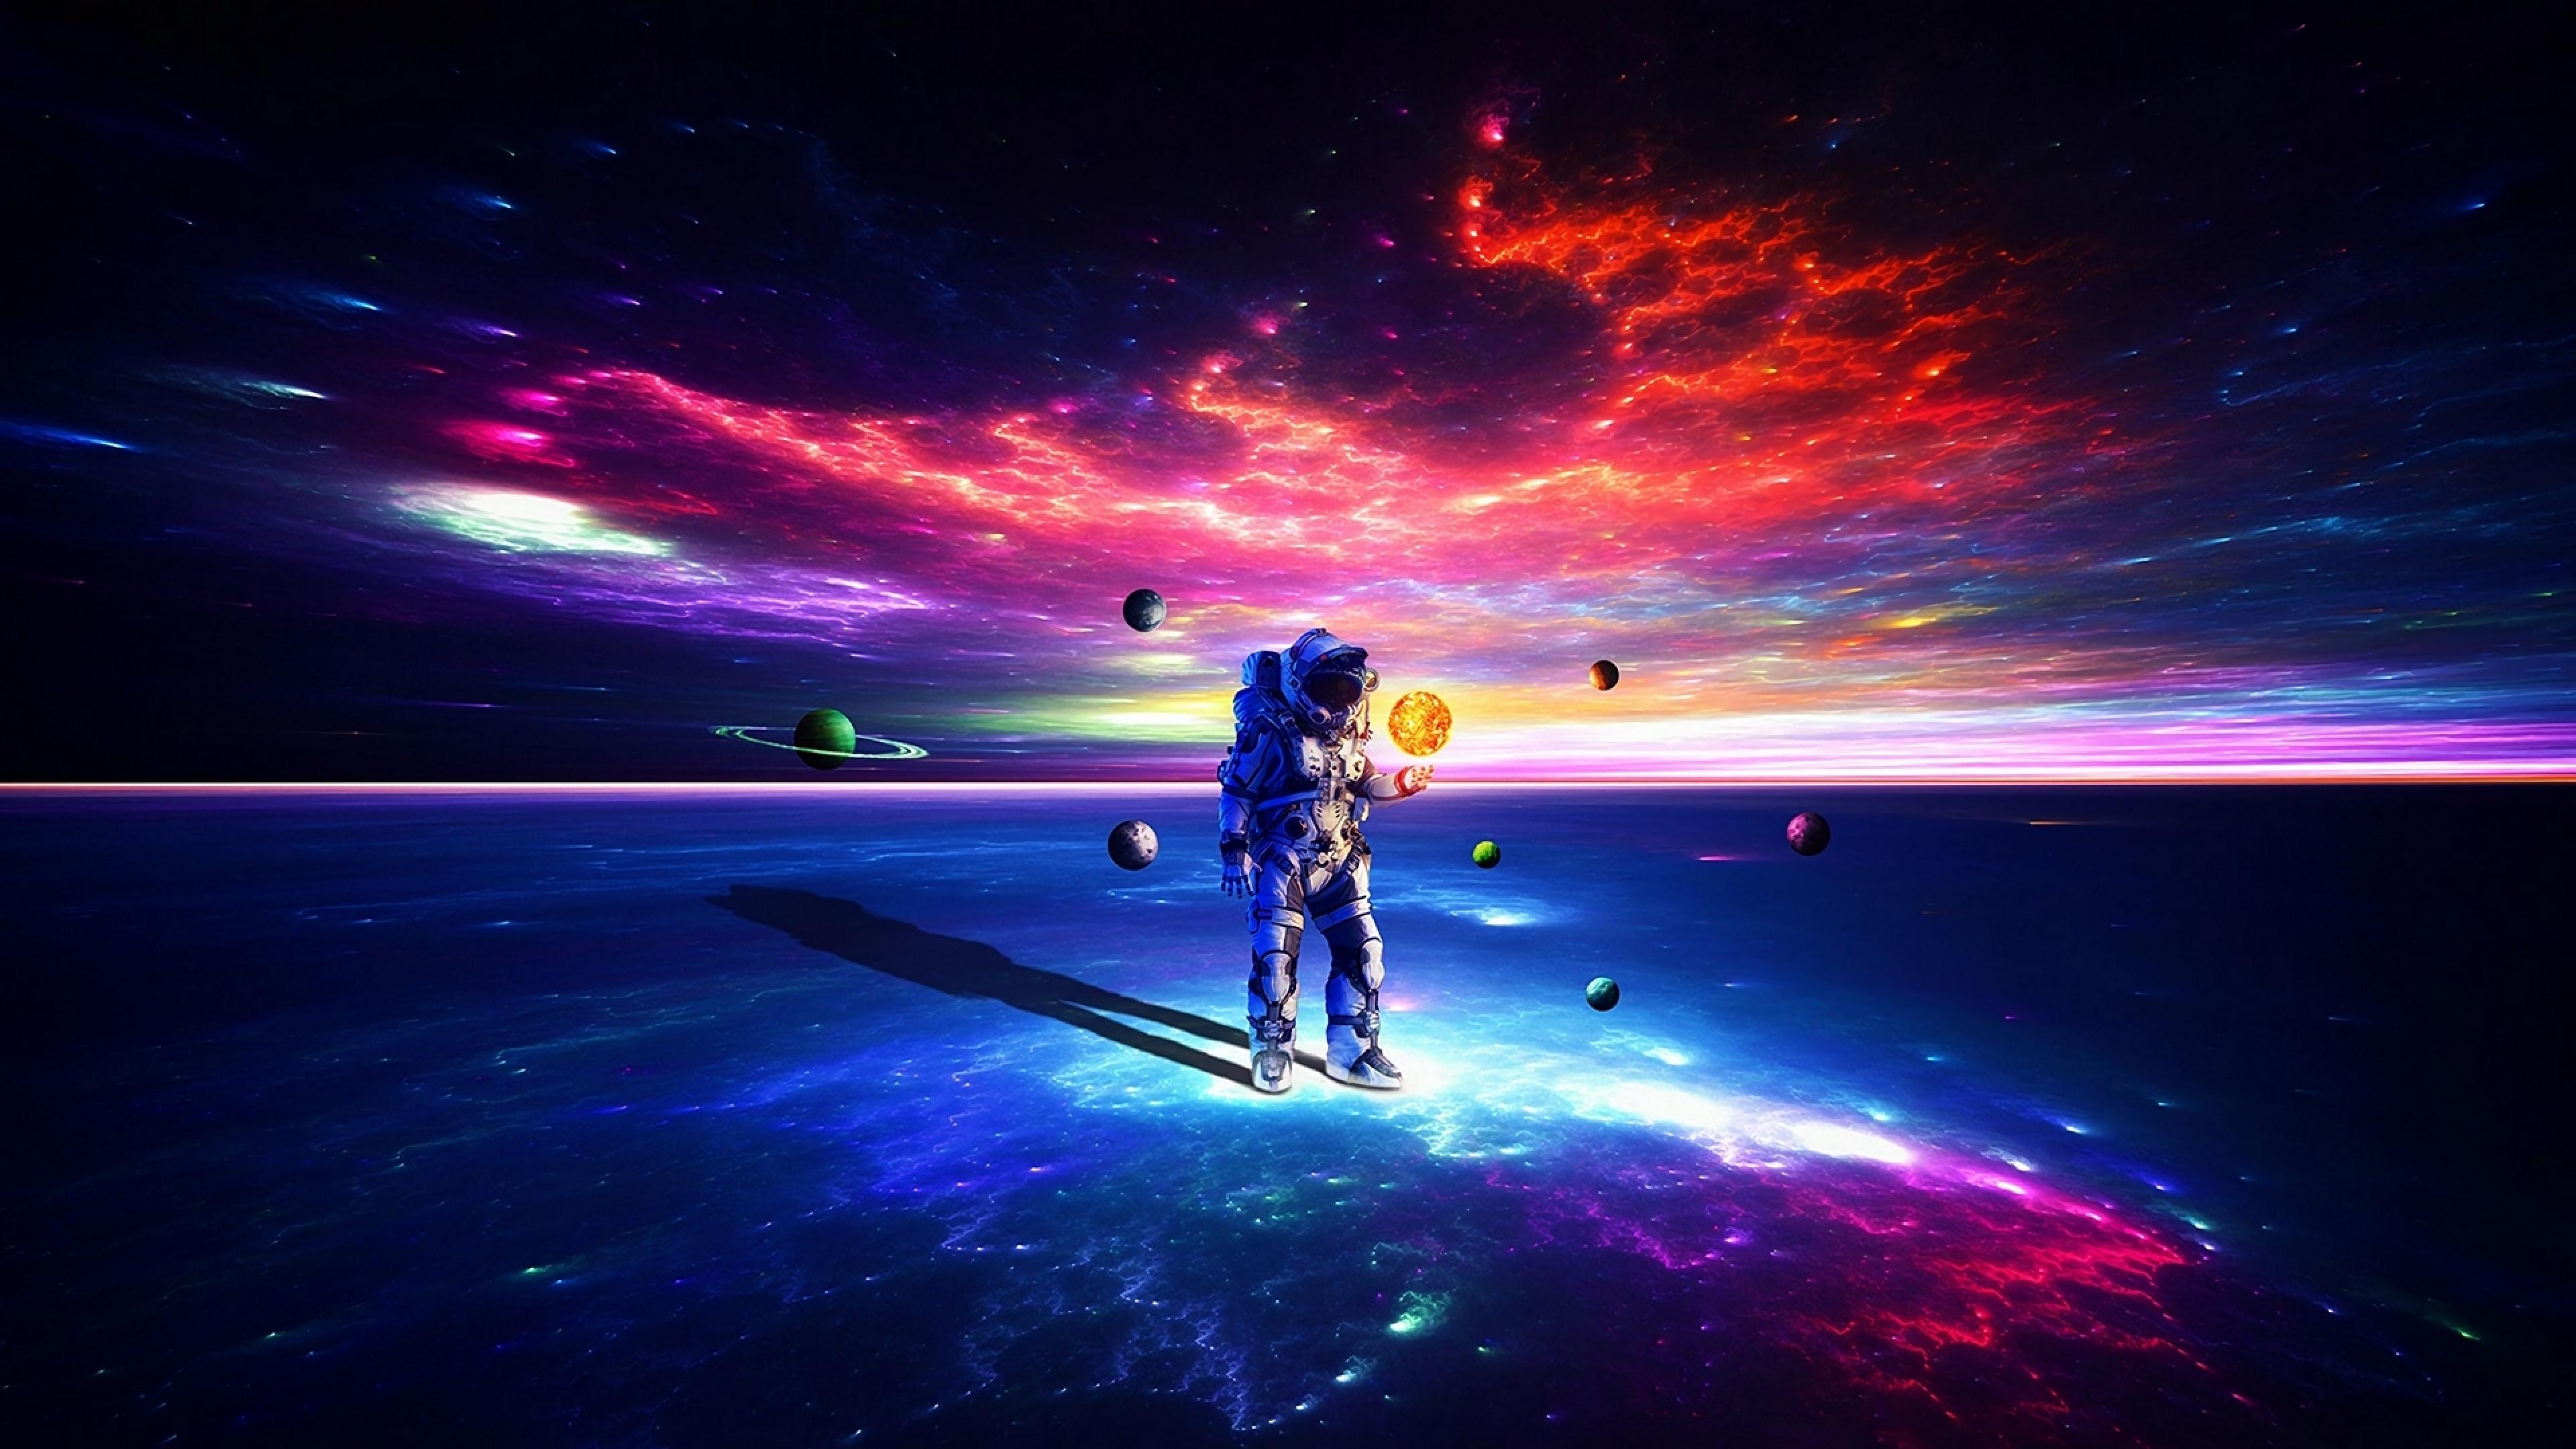 3840x2160 Astronaut Exploring Space 4K Wallpaper, HD ...